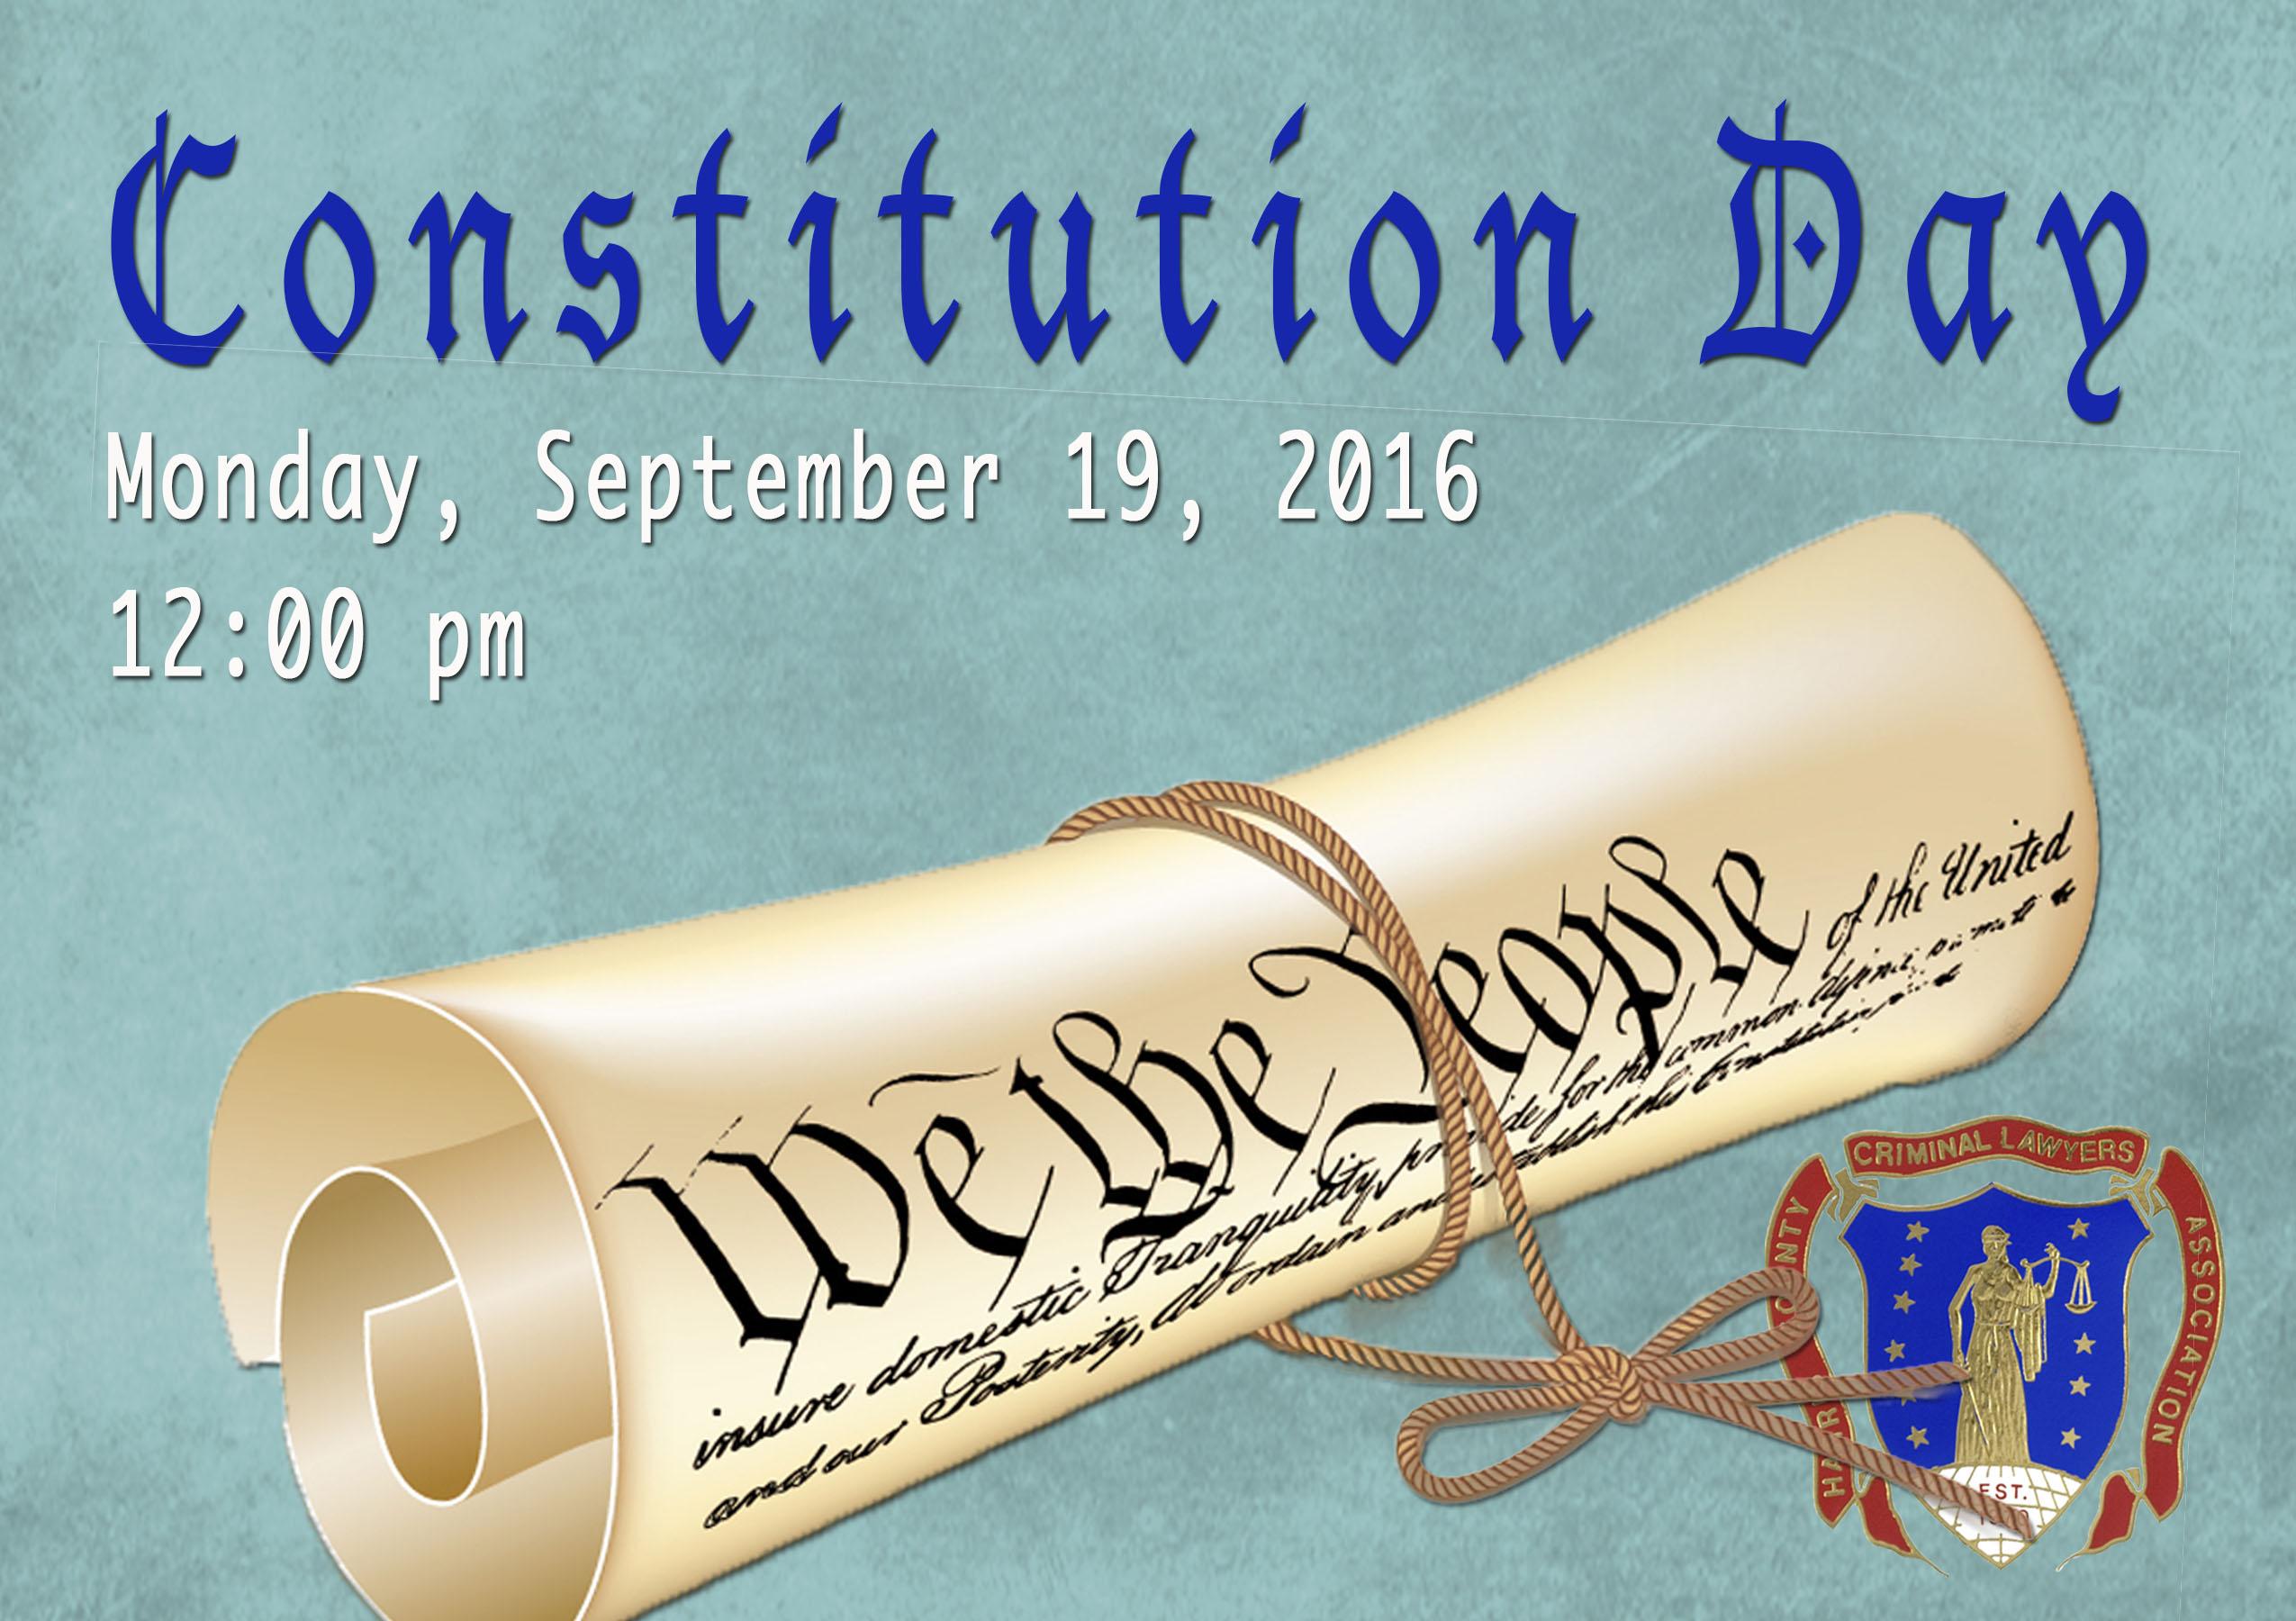 pr constitution day 2016